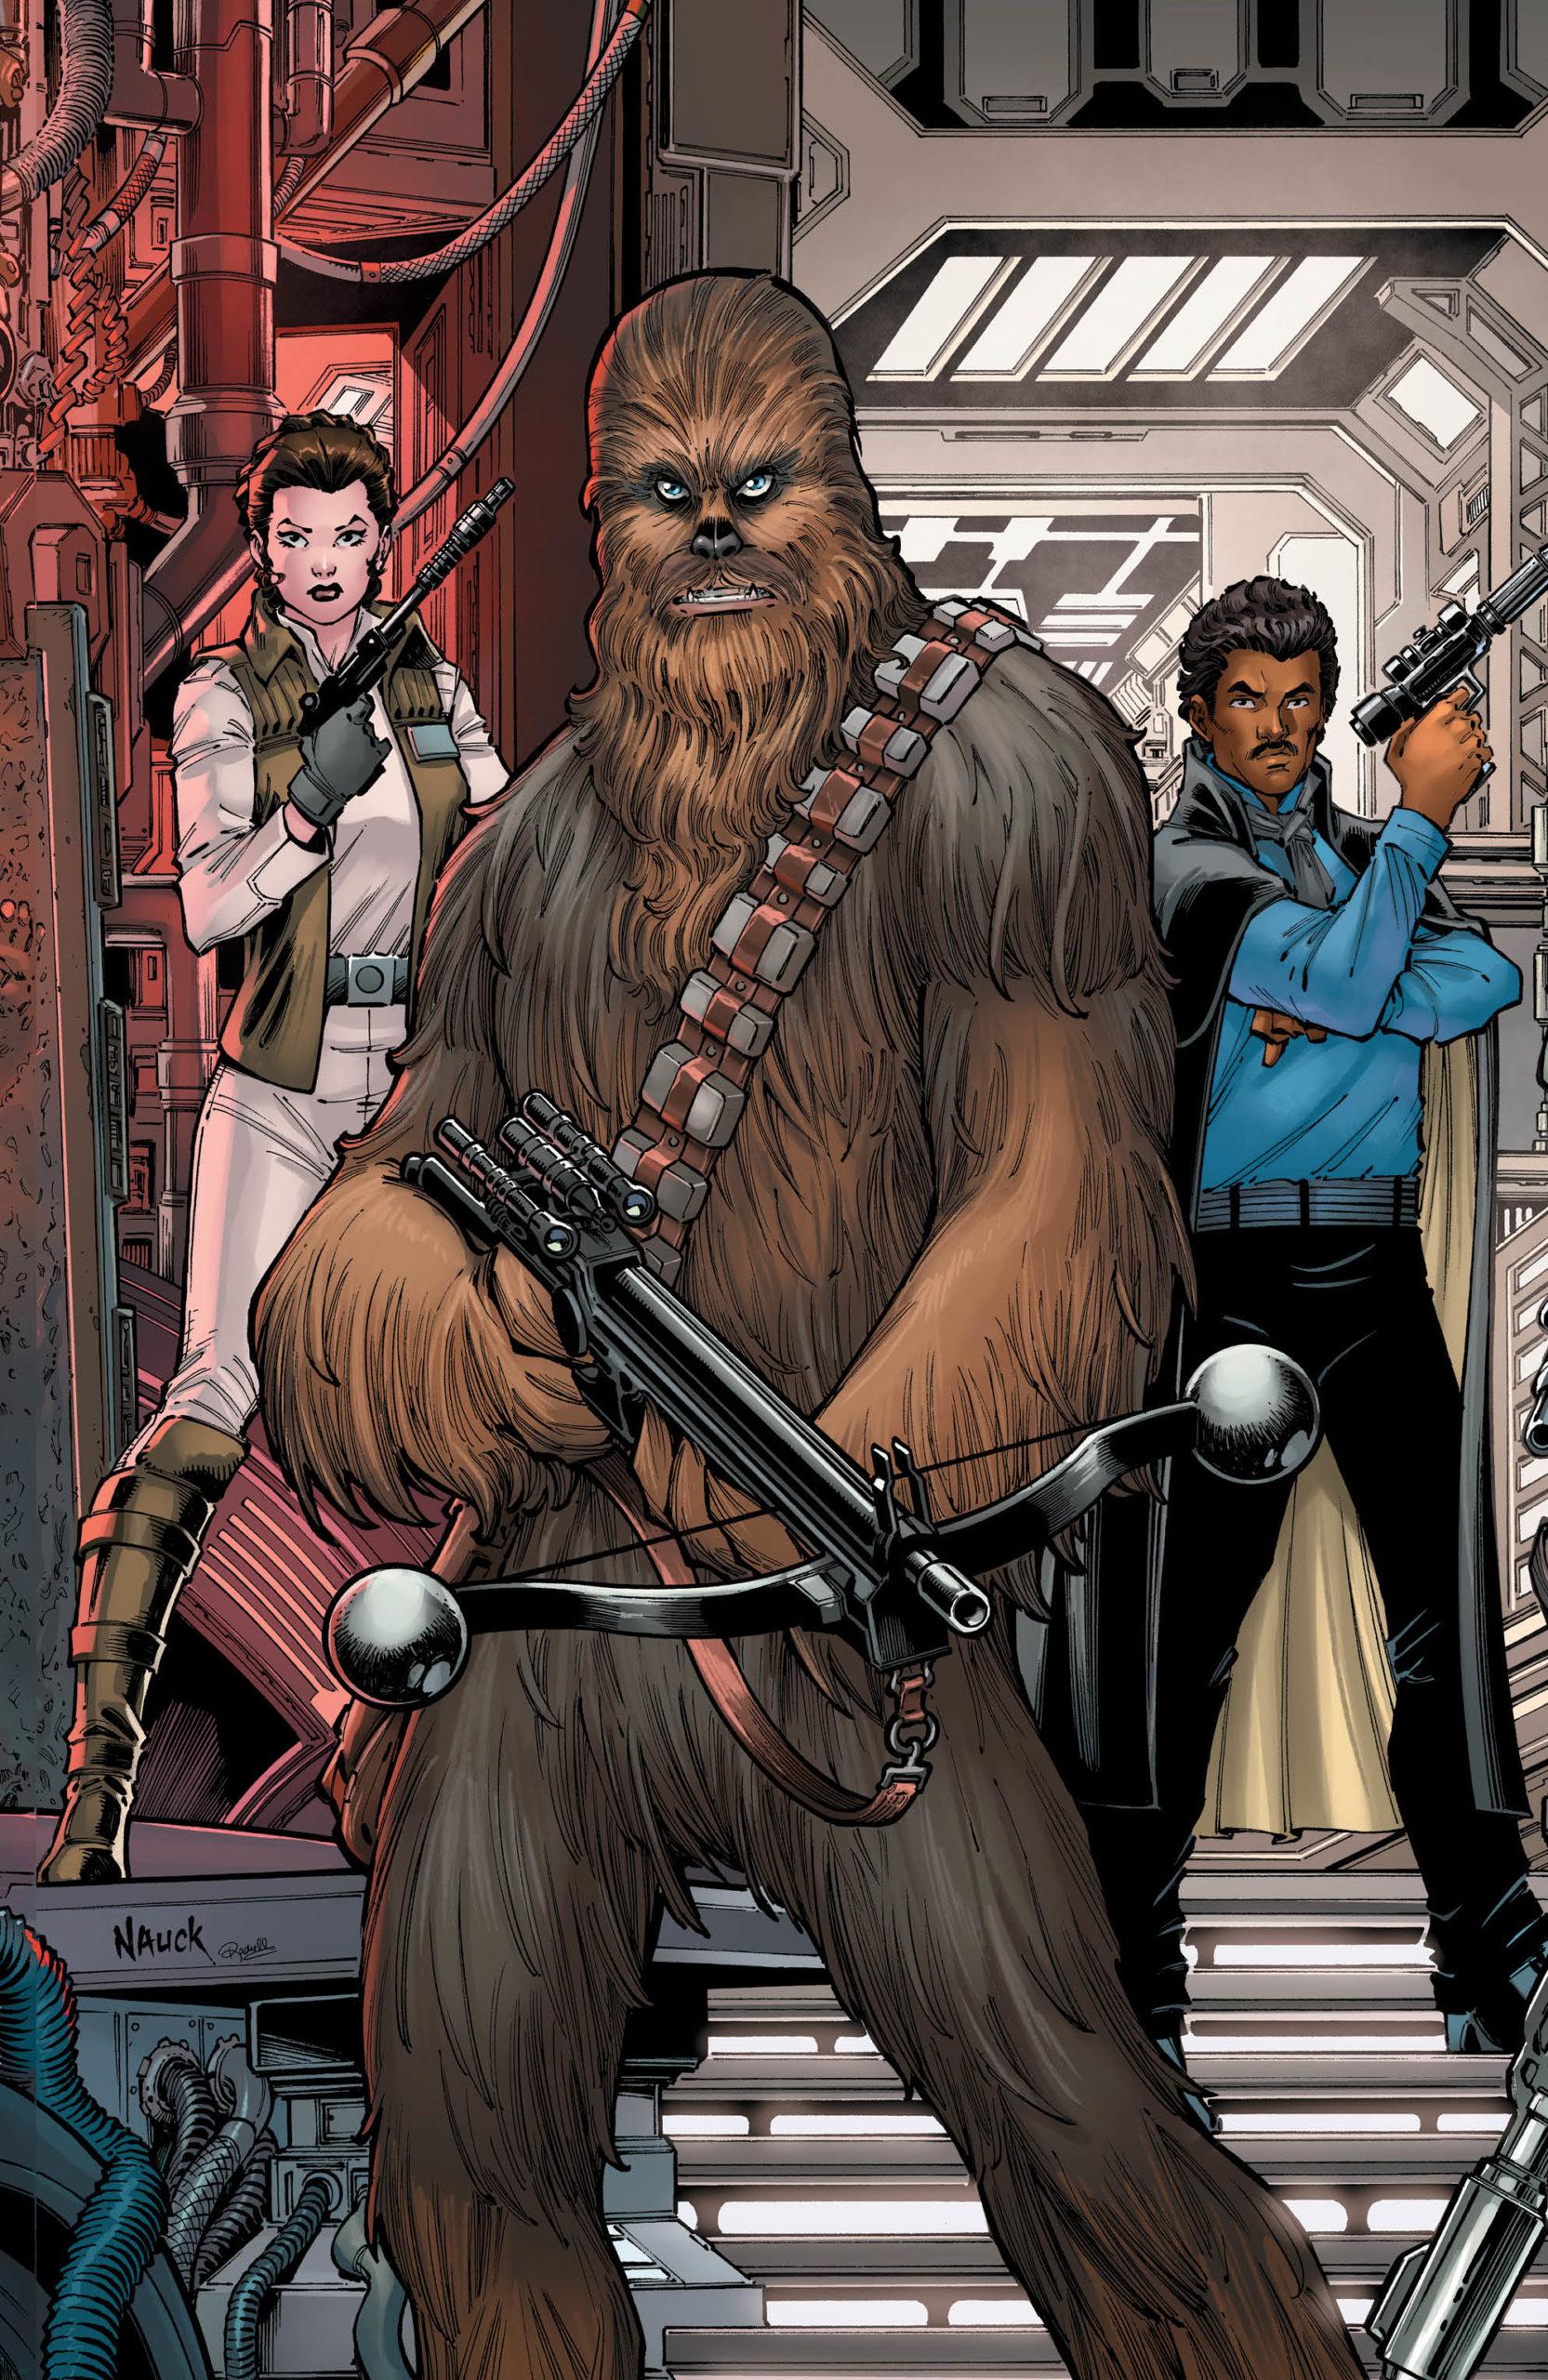 War of the Bounty Hunters #3 (Todd Nauck Virgin Variant Cover) (18.08.2021)